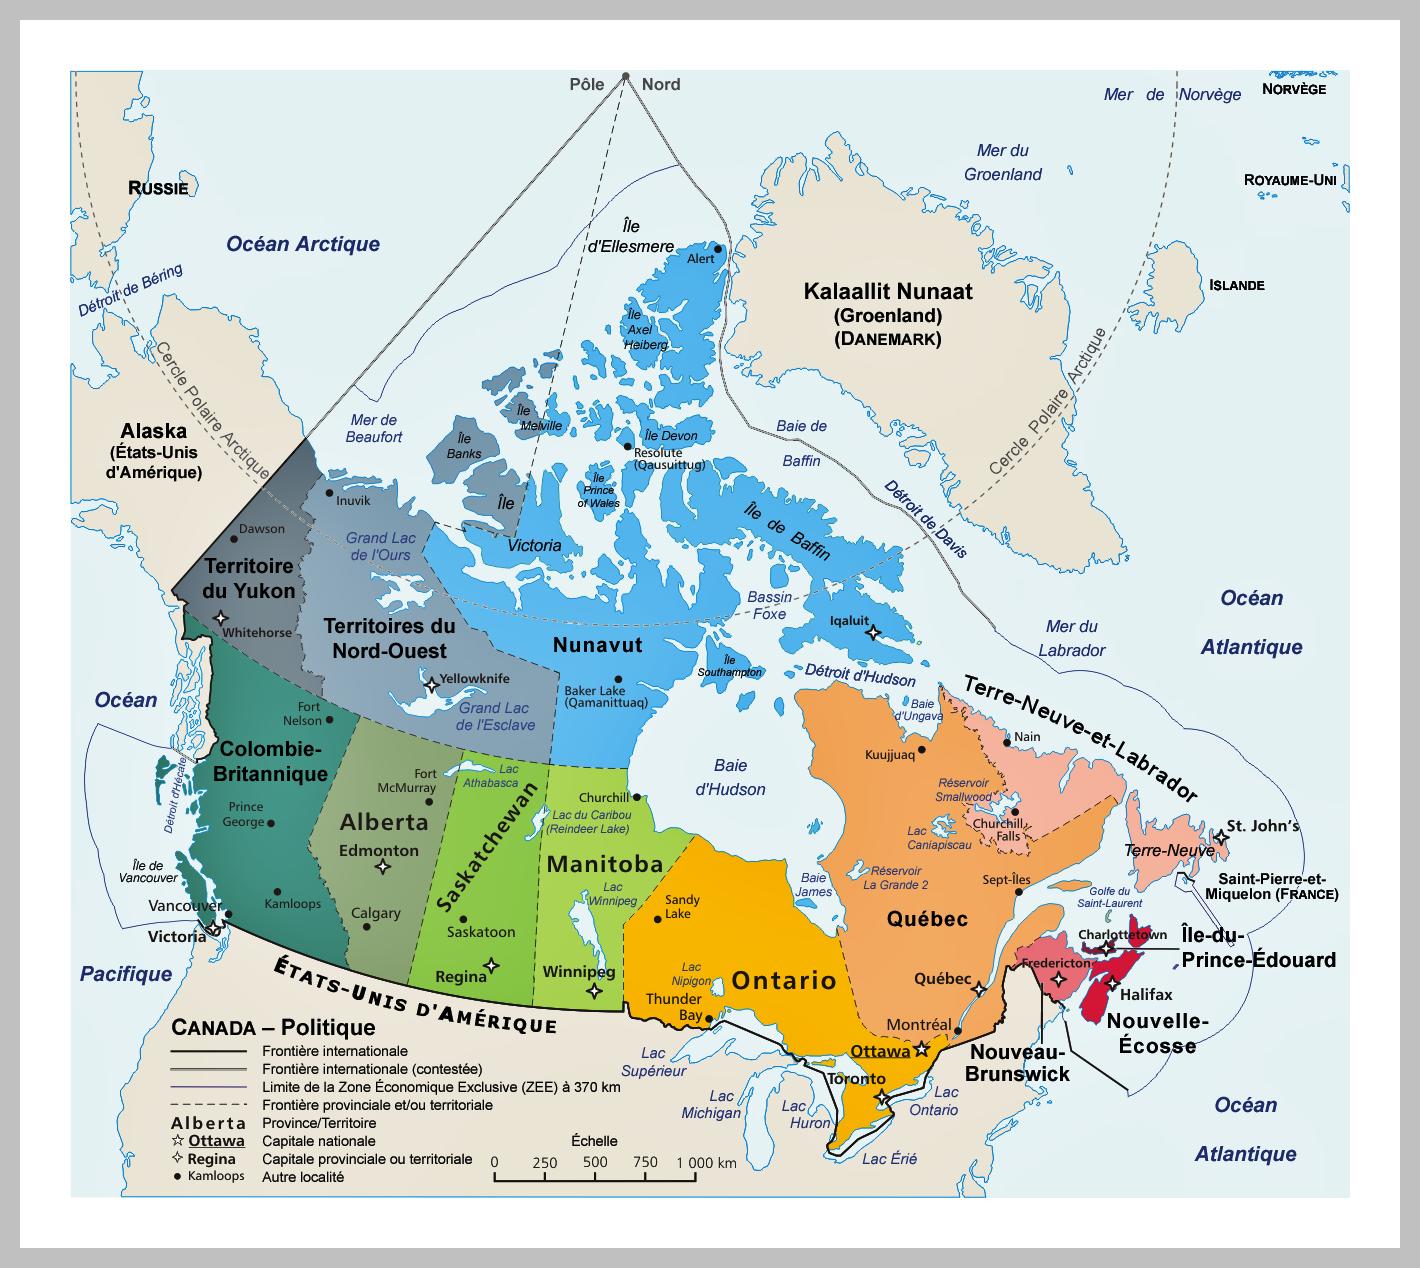 MUTINE NEWSY: CARTE DU QUEBEC, CANADA, VILLE DE MONTREAL